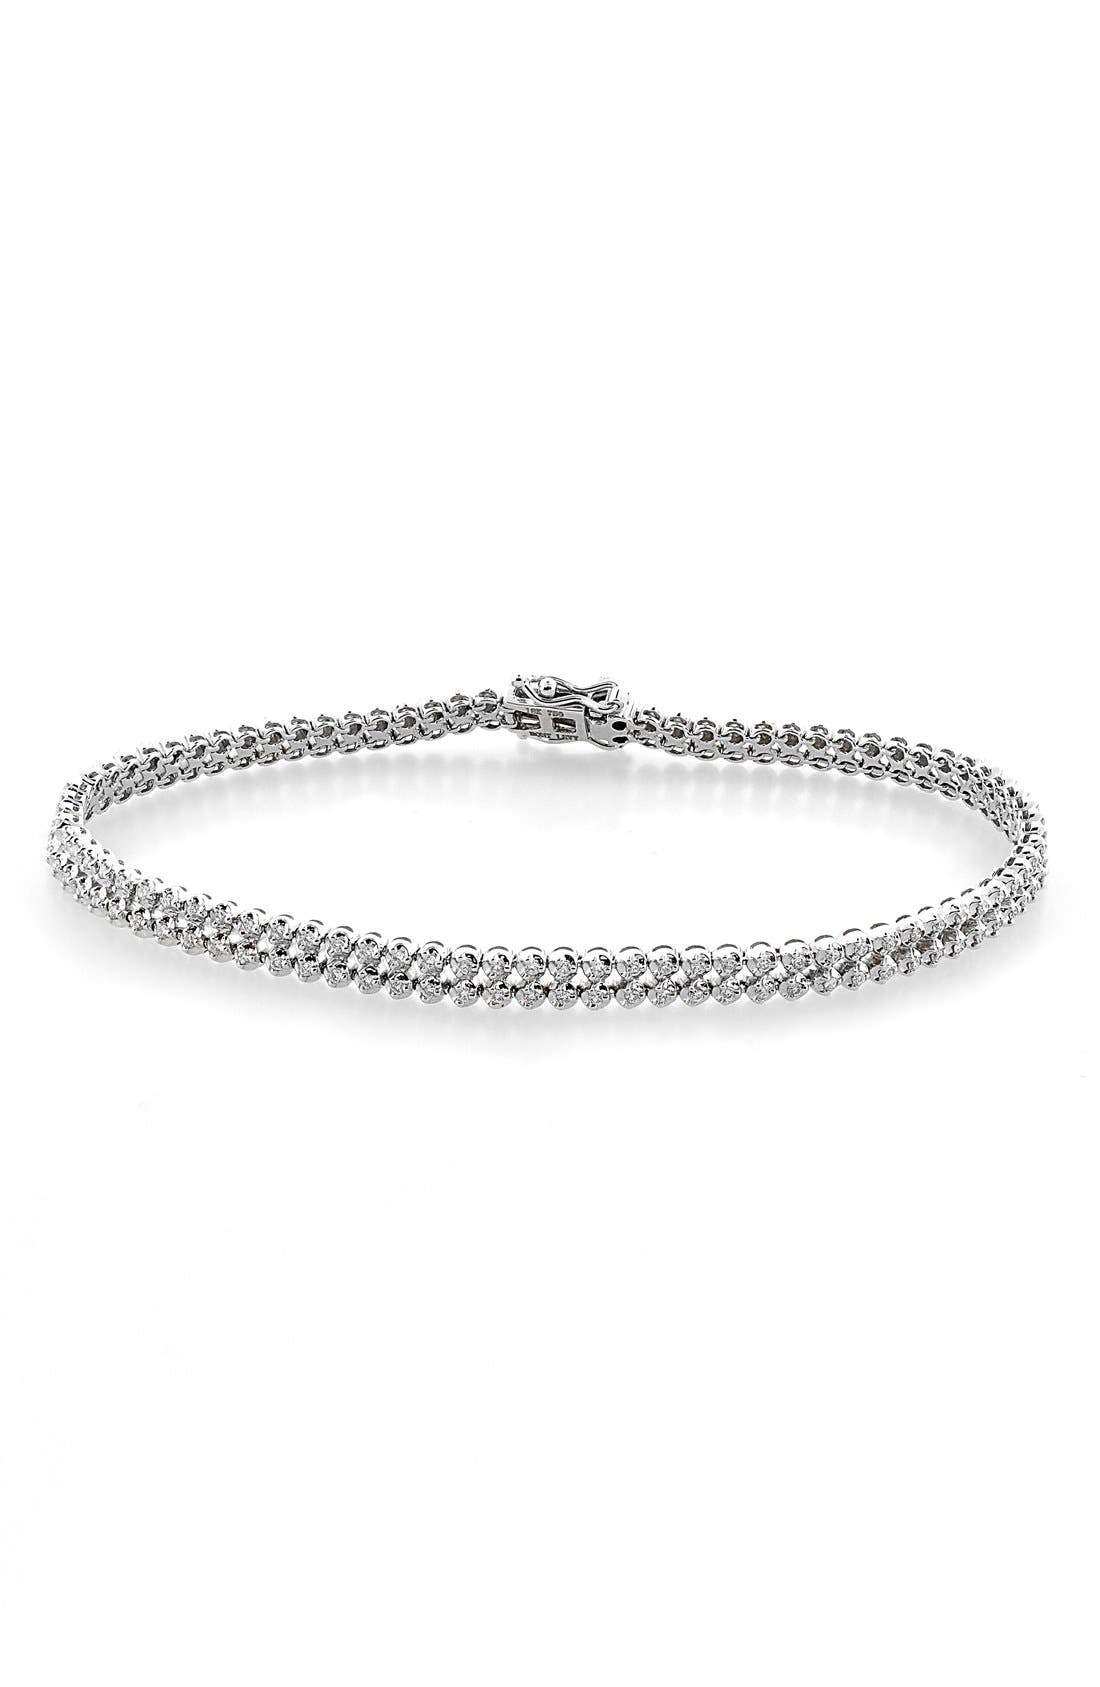 Diamond Line Bracelet,                             Main thumbnail 1, color,                             WHITE GOLD